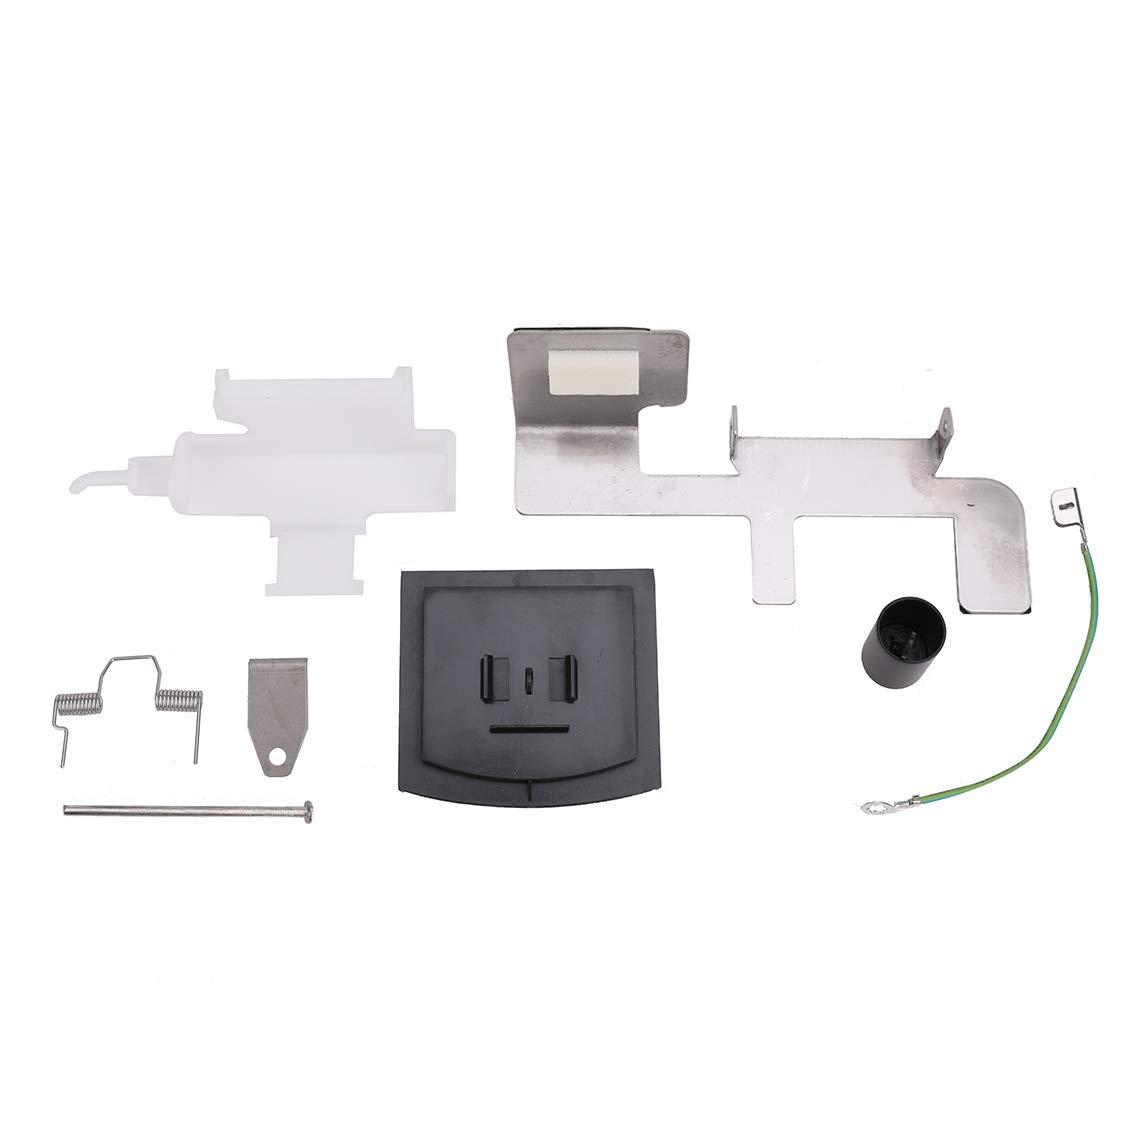 8201756 Refrigerator Ice Dispenser Door Kit for Whirlpool, Maytag, Kenmore, Crosley. Ice Door Kit Replace 8201756, 8201756VP, W10823377, WP2180353 by Grete Gotye